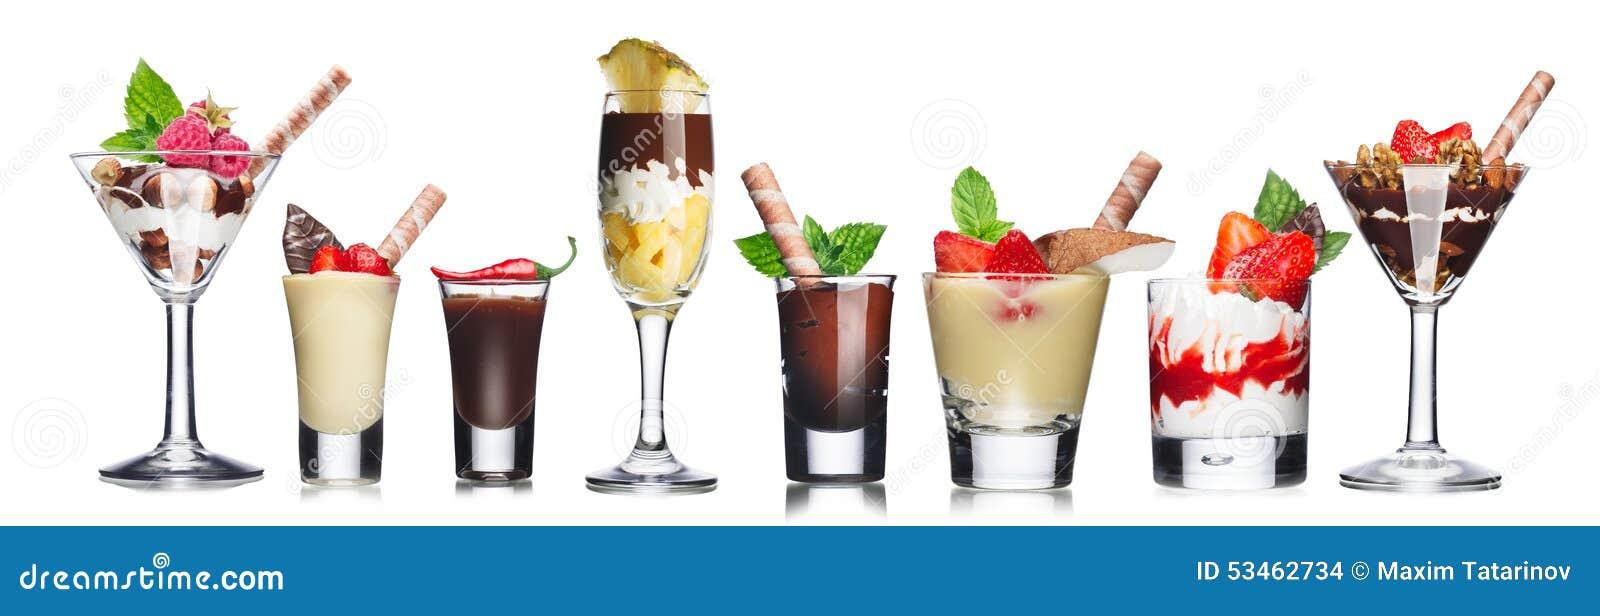 Parfait-layered desserts